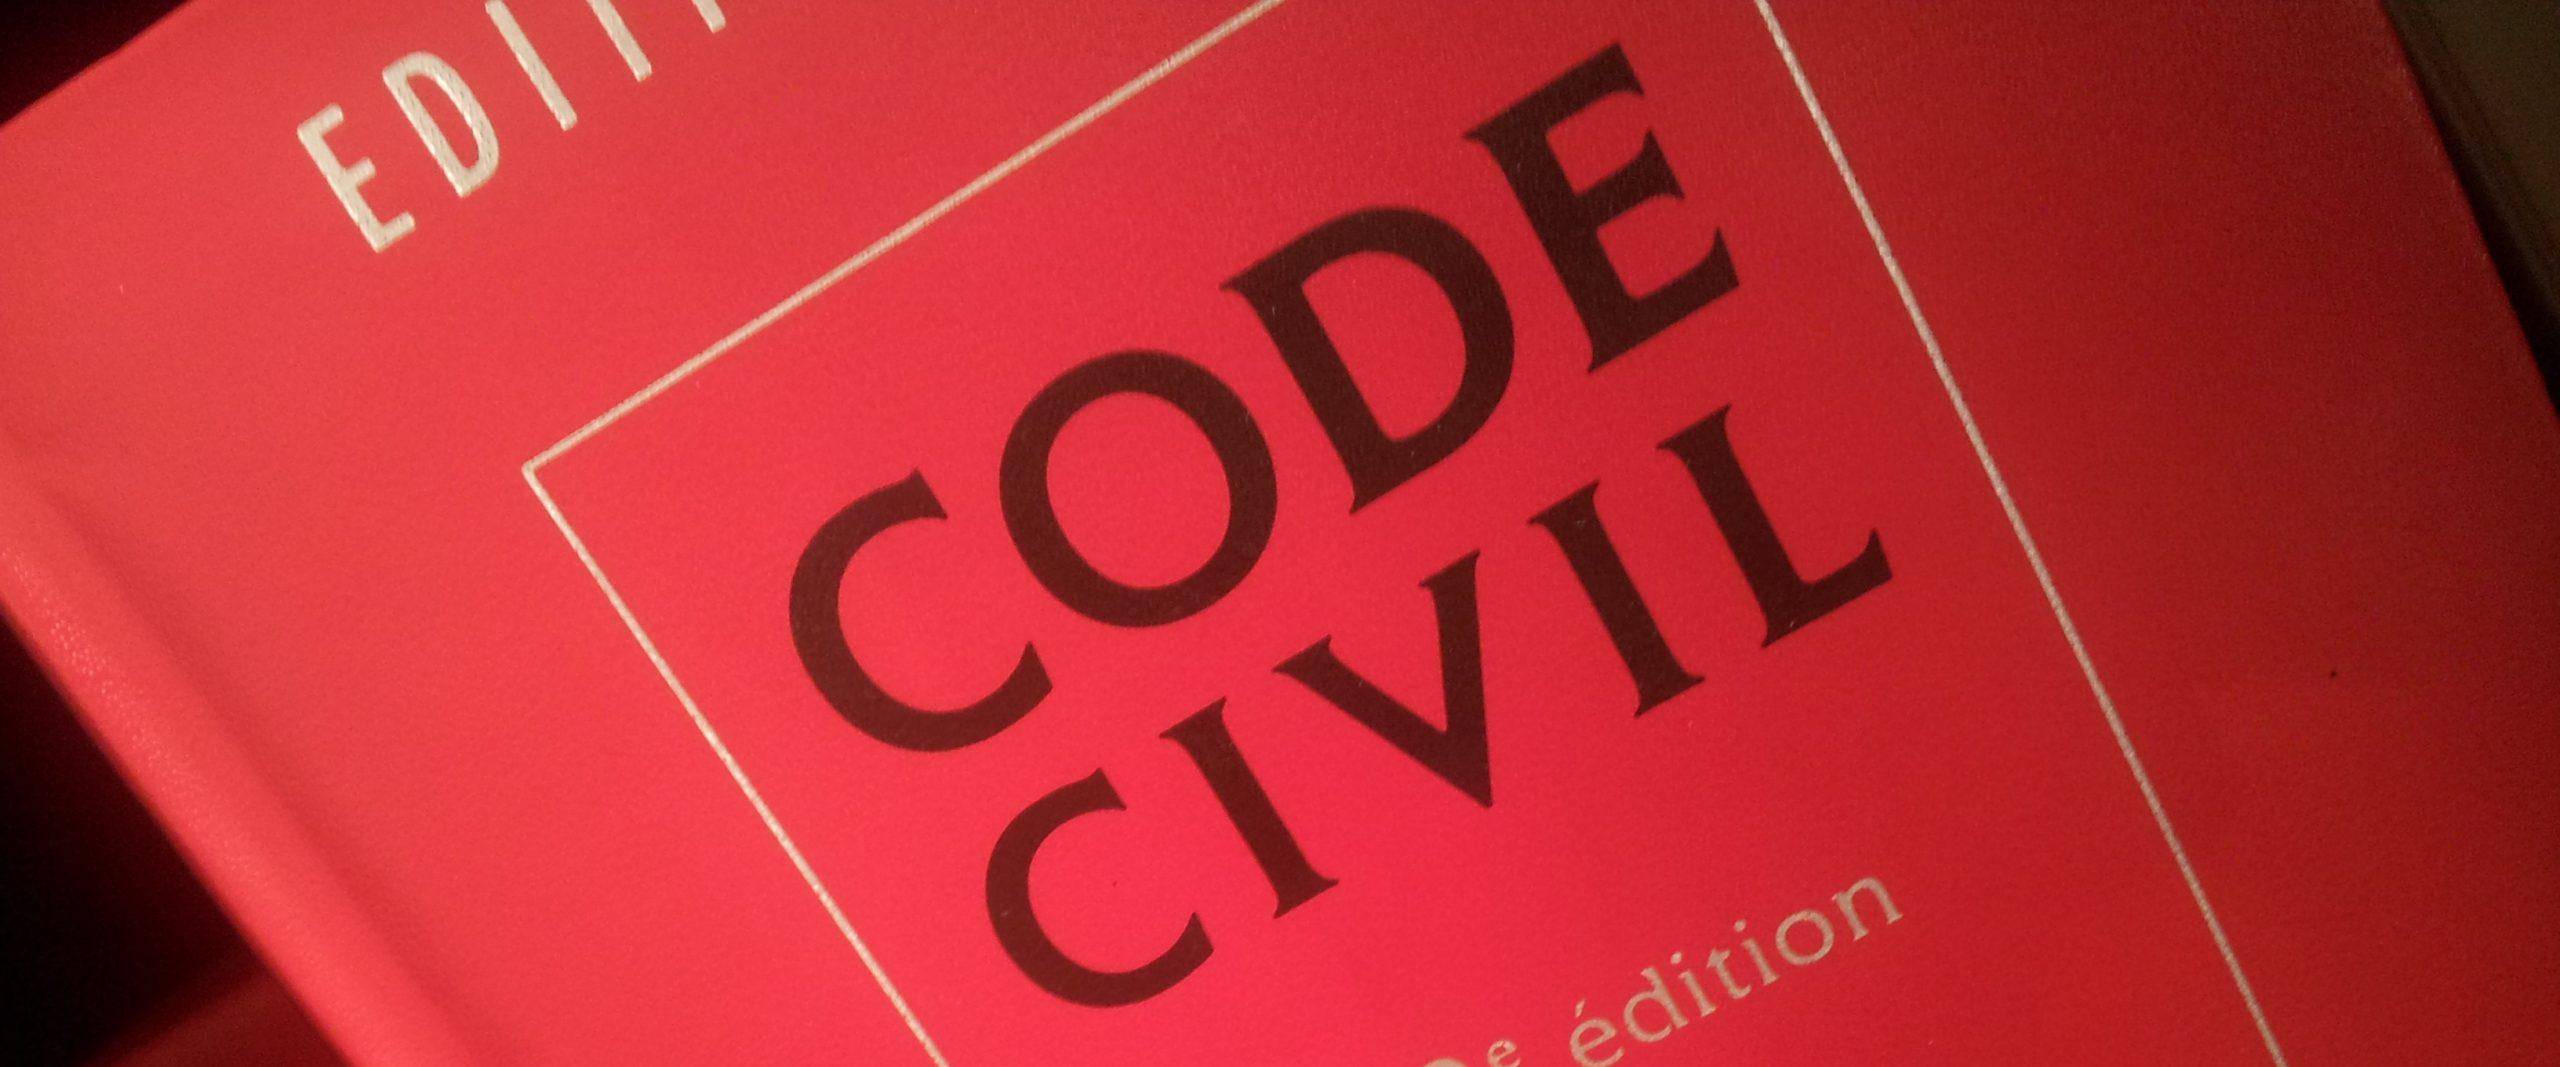 concurrence-deloyale-def-definition-juridique-code-civil